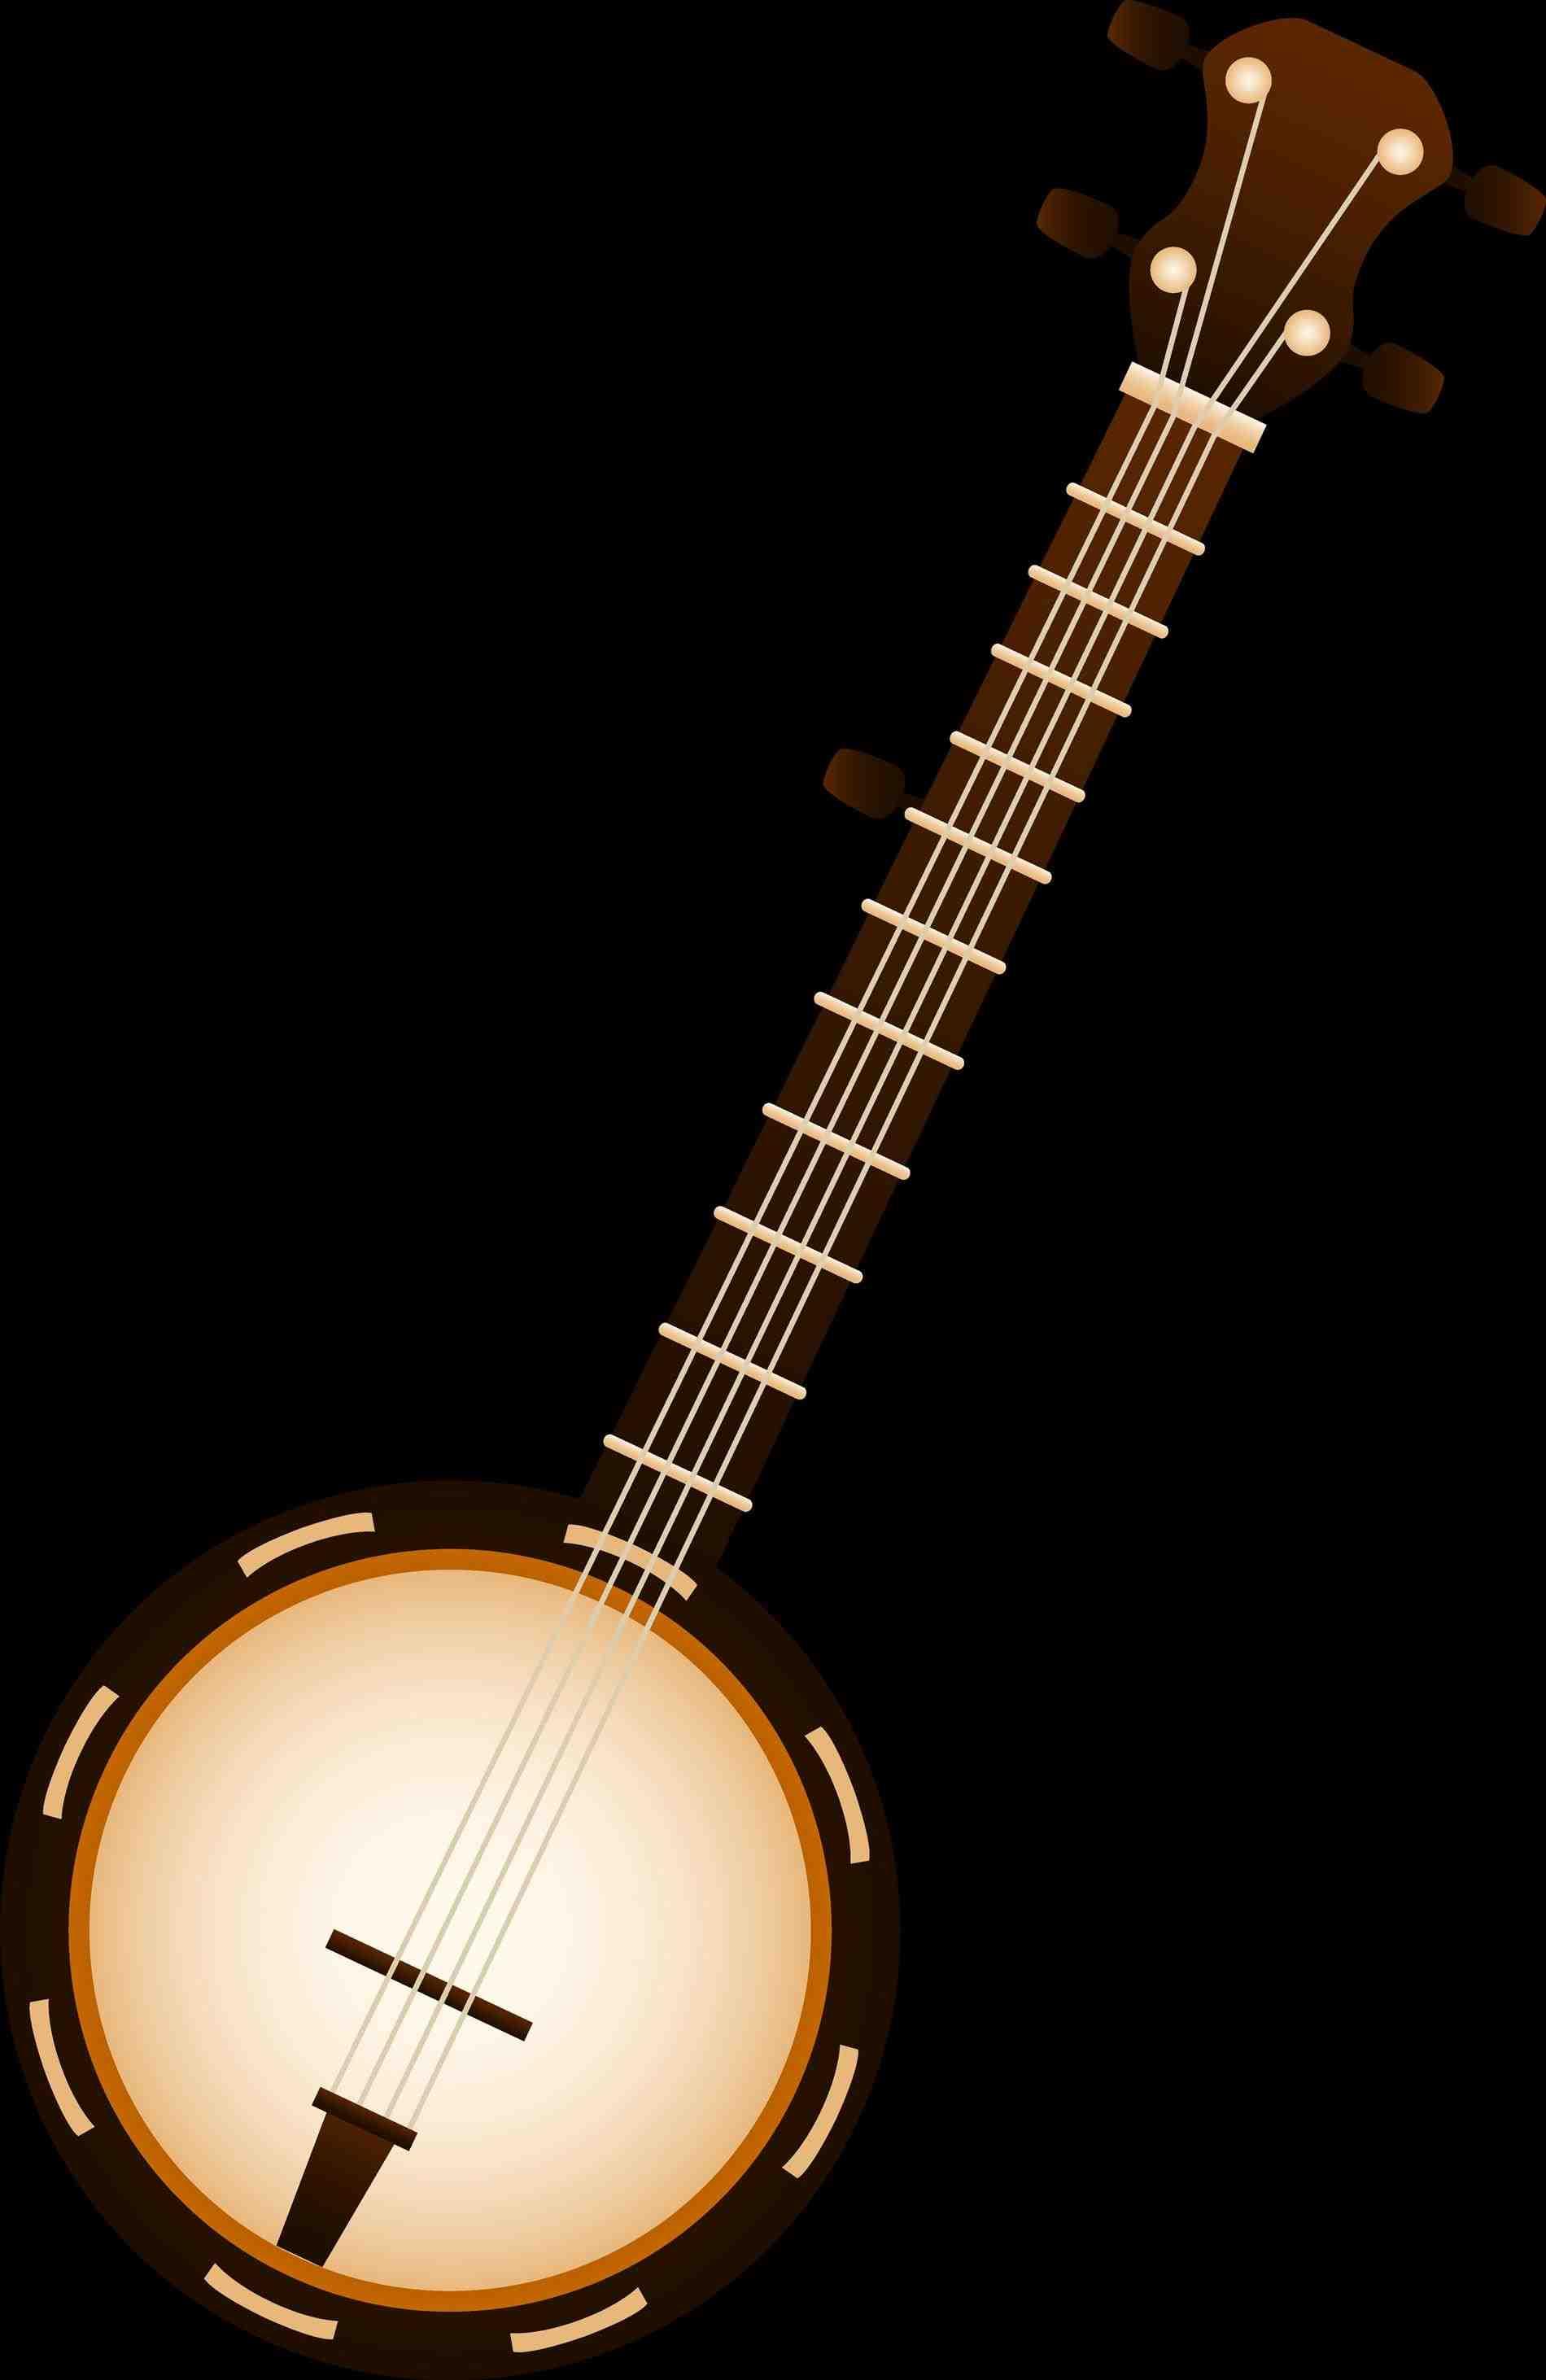 Images panda free classical. Banjo clipart mandolin